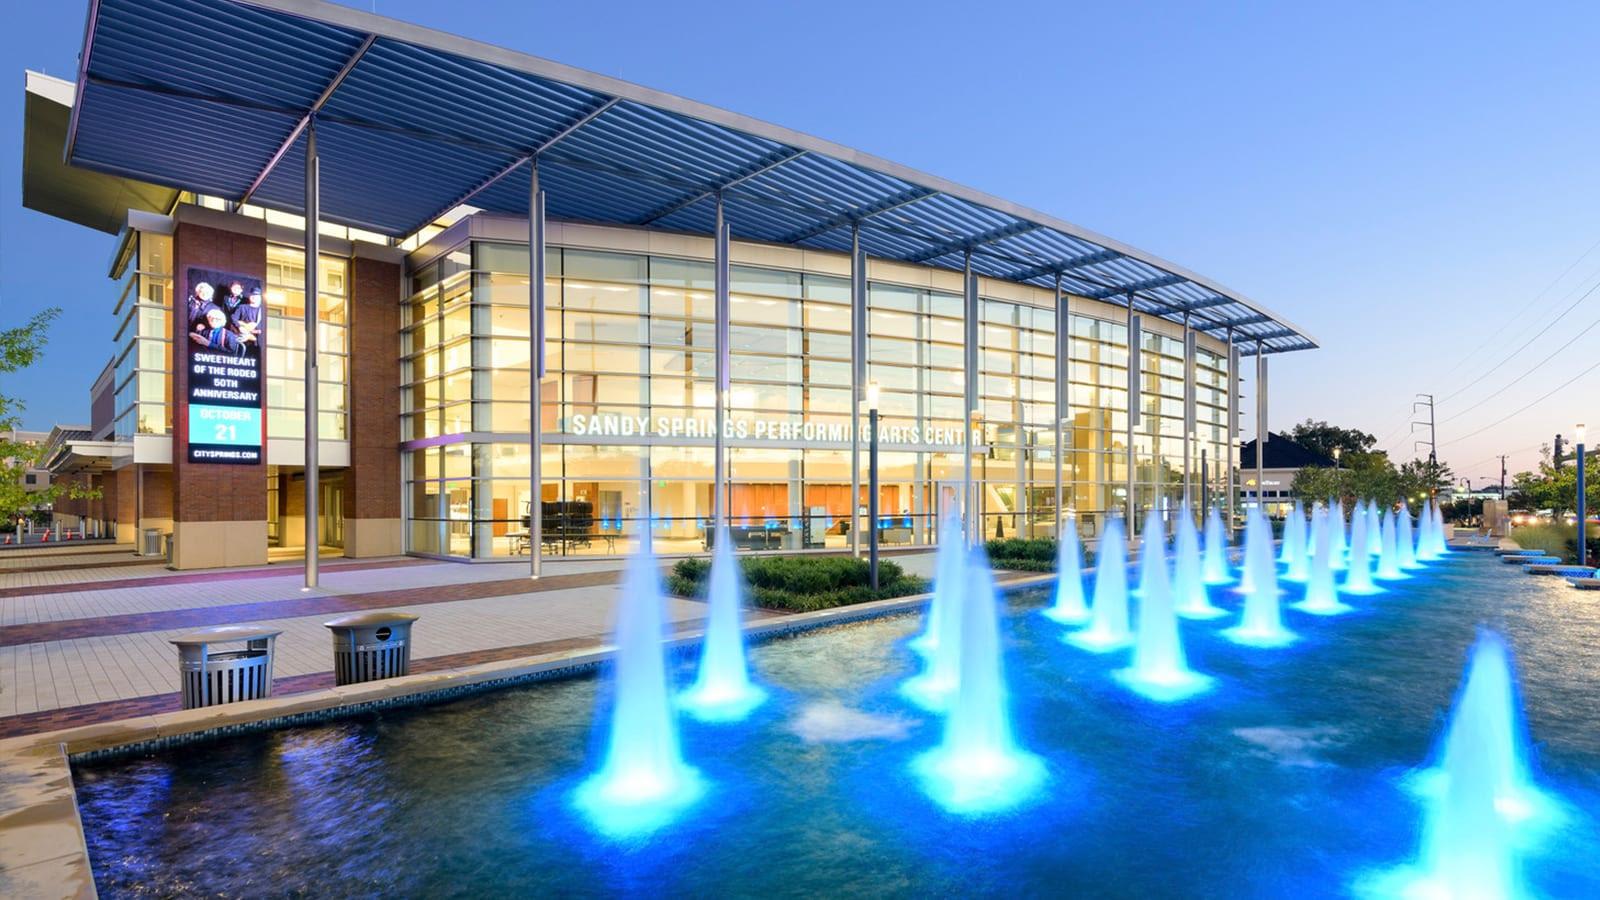 Exterior of Sandy Springs City Center